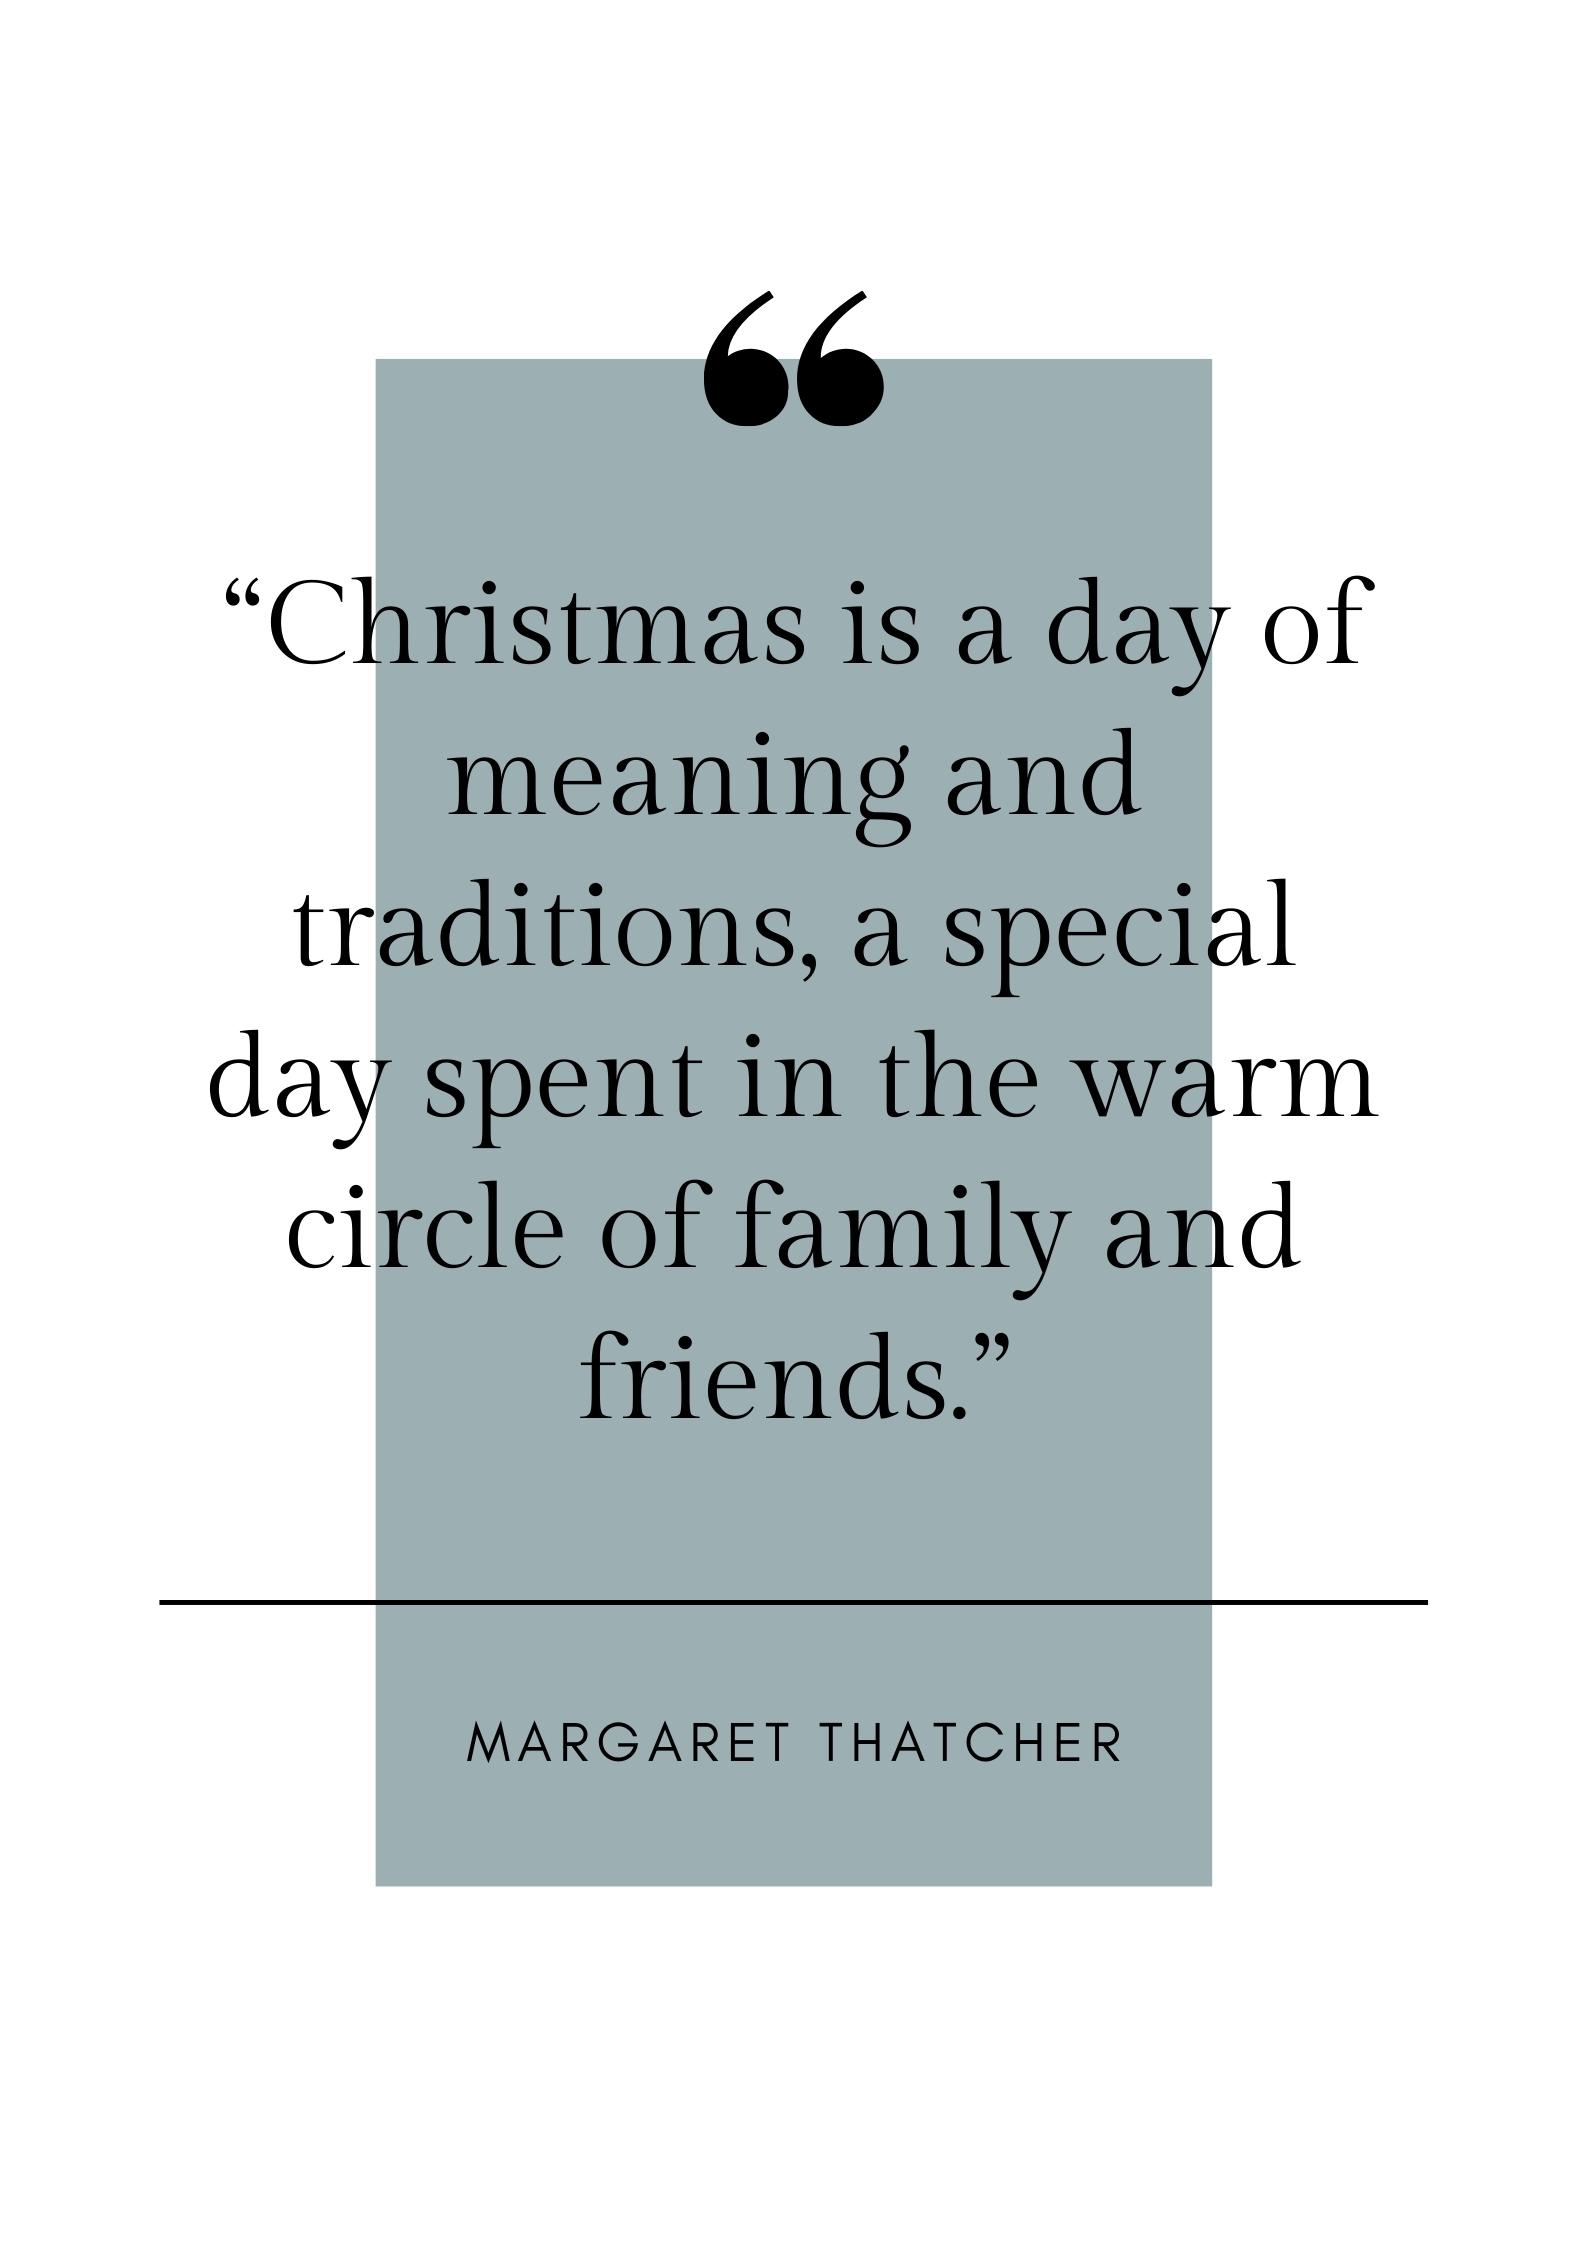 Margaret thatcher Christmas quote